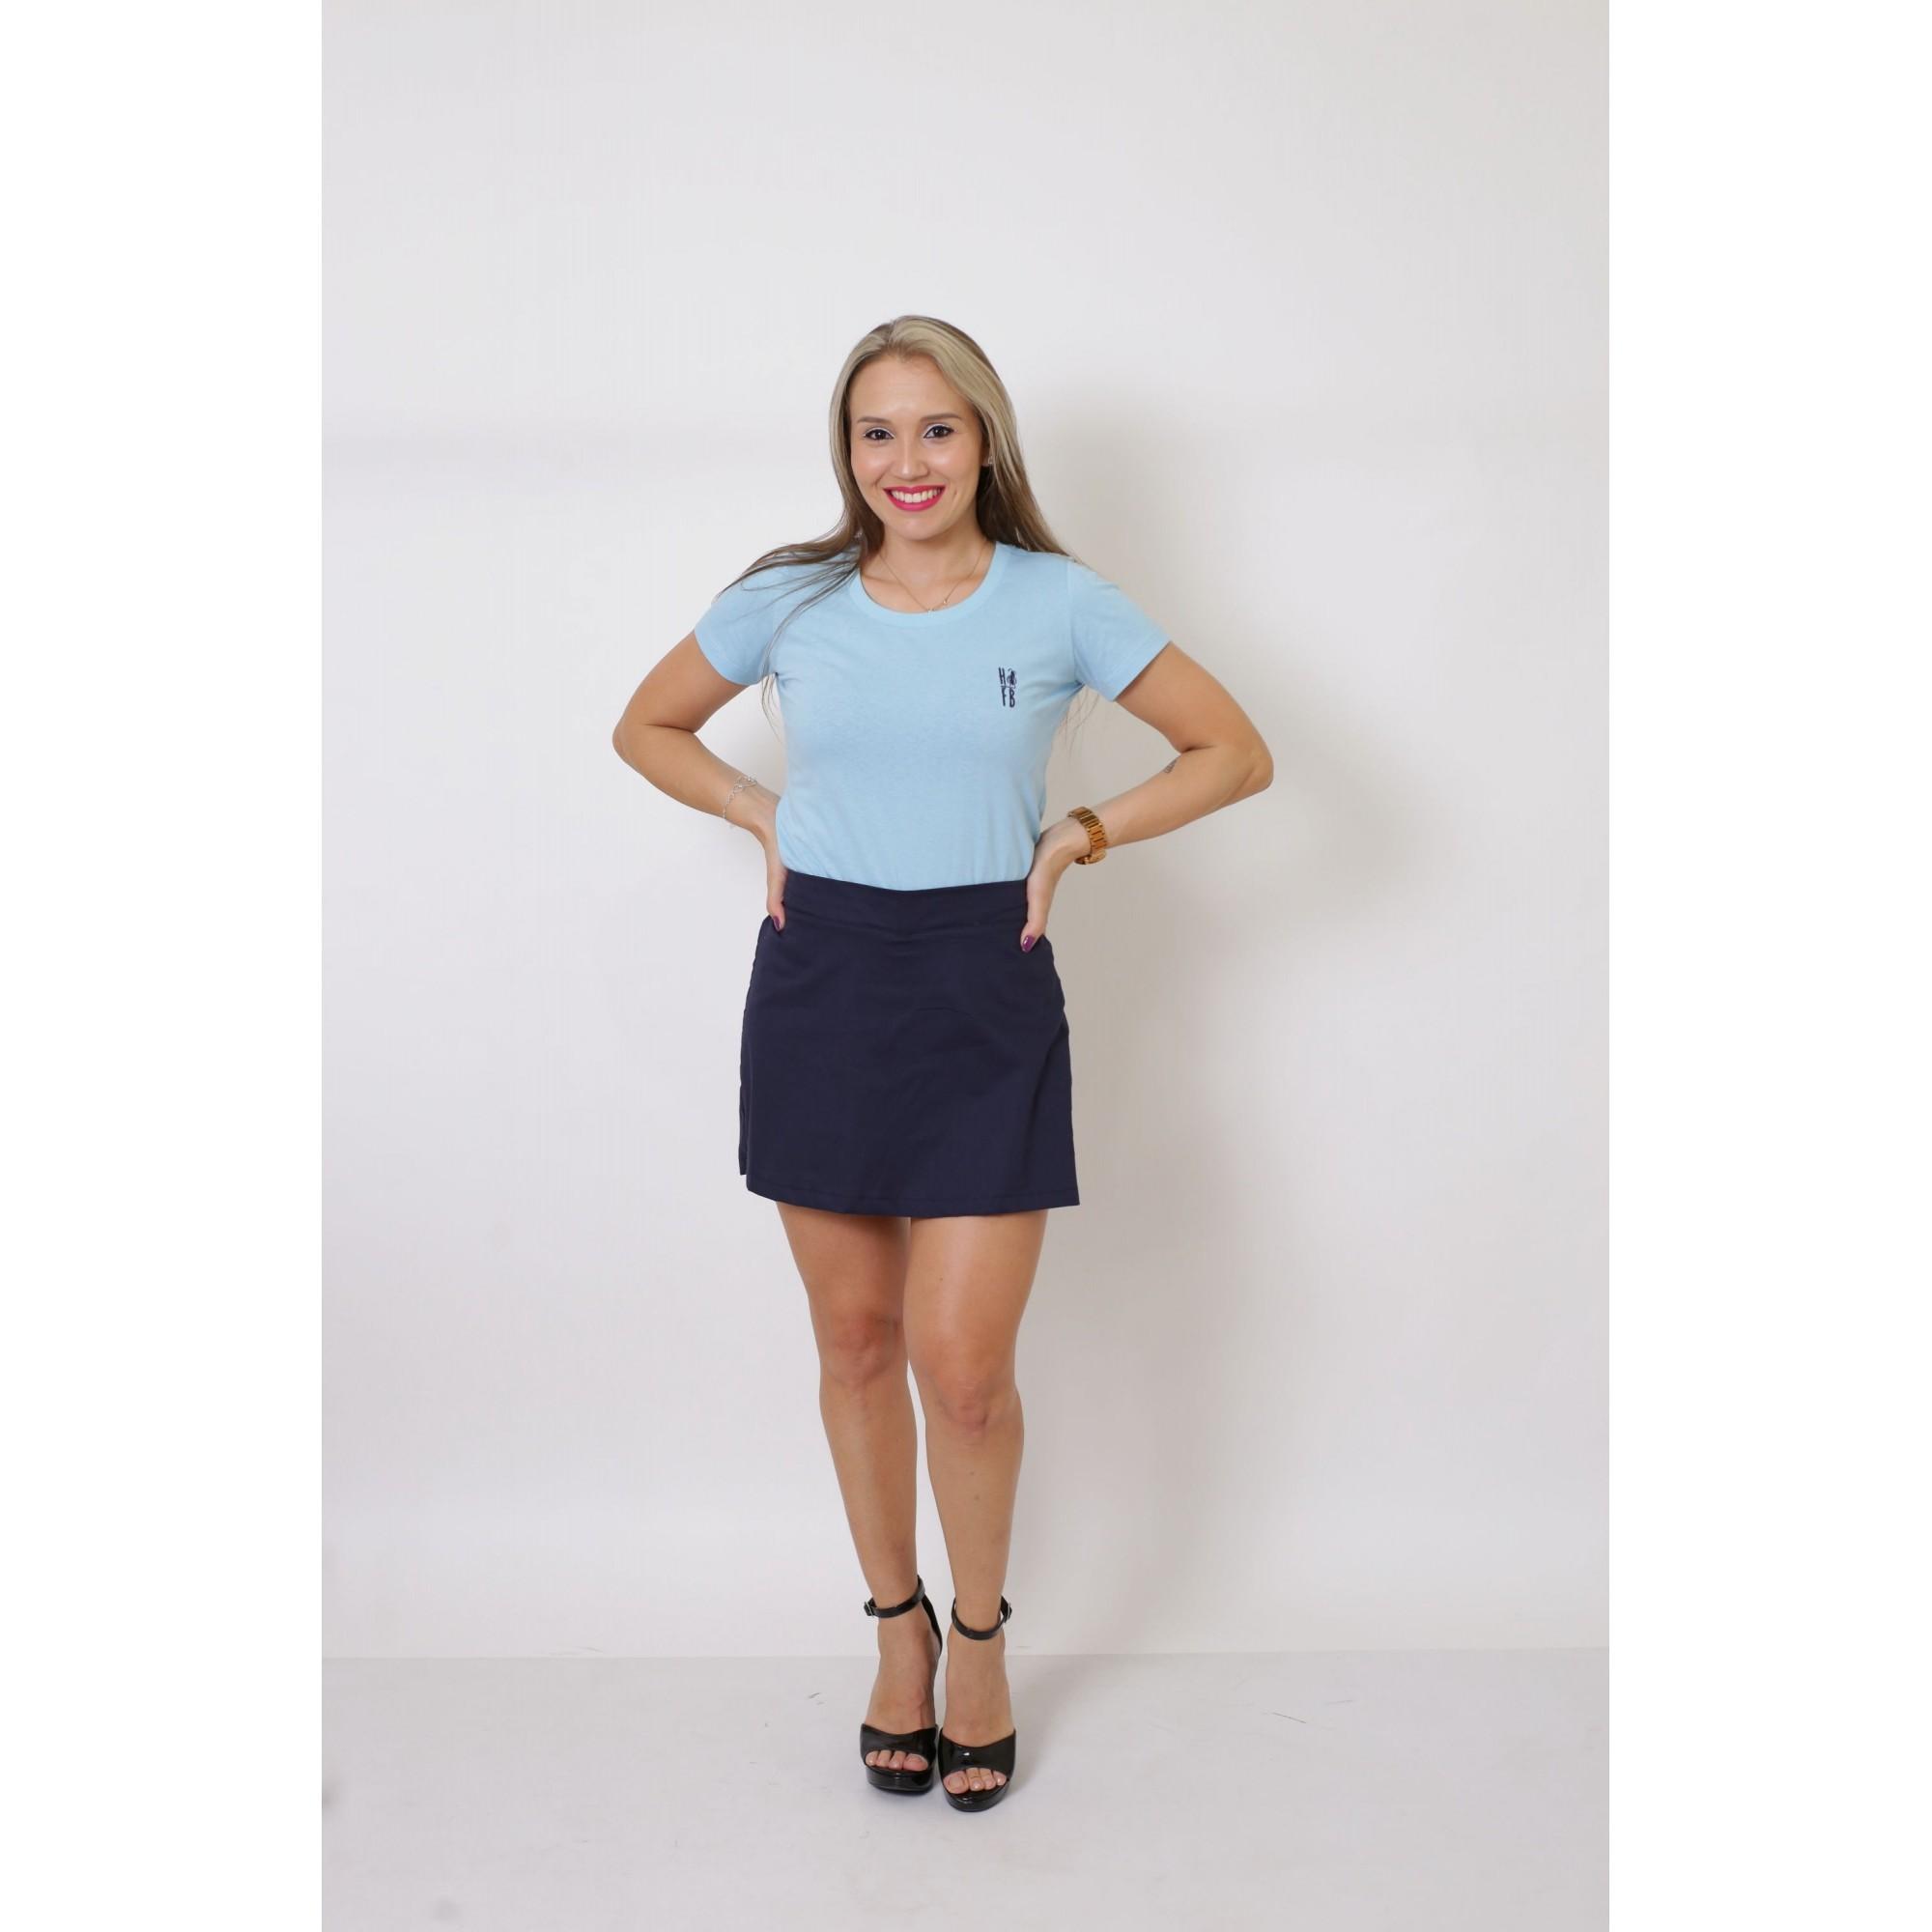 T-Shirt Azul Bebê Feminina  - Heitor Fashion Brazil